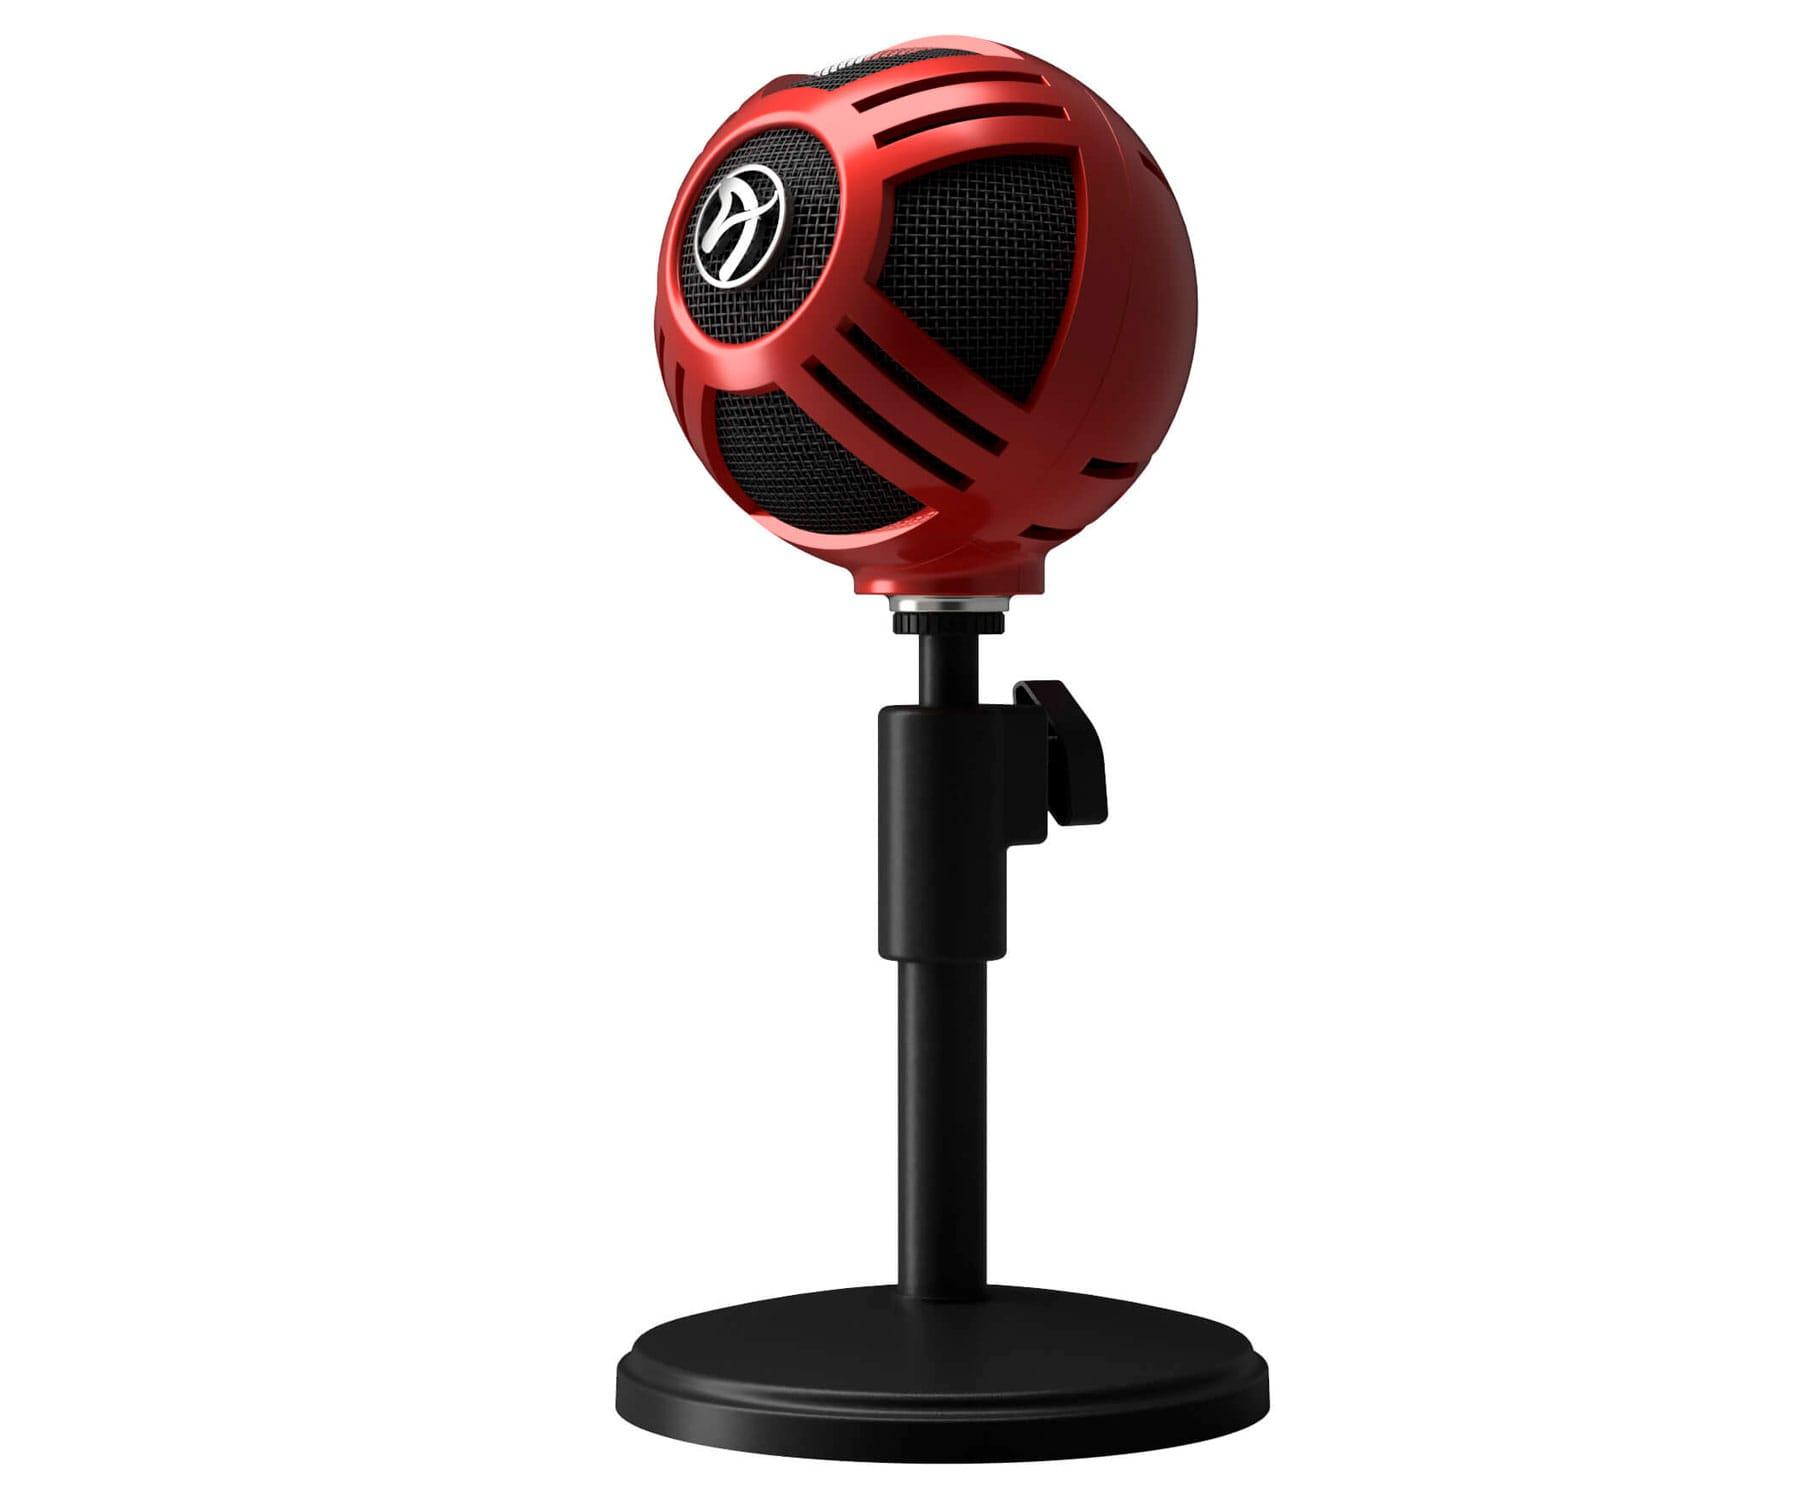 Arozzi Sfera Micrófono Gaming Rojo/USB/ Plug-and-play/Cardioide